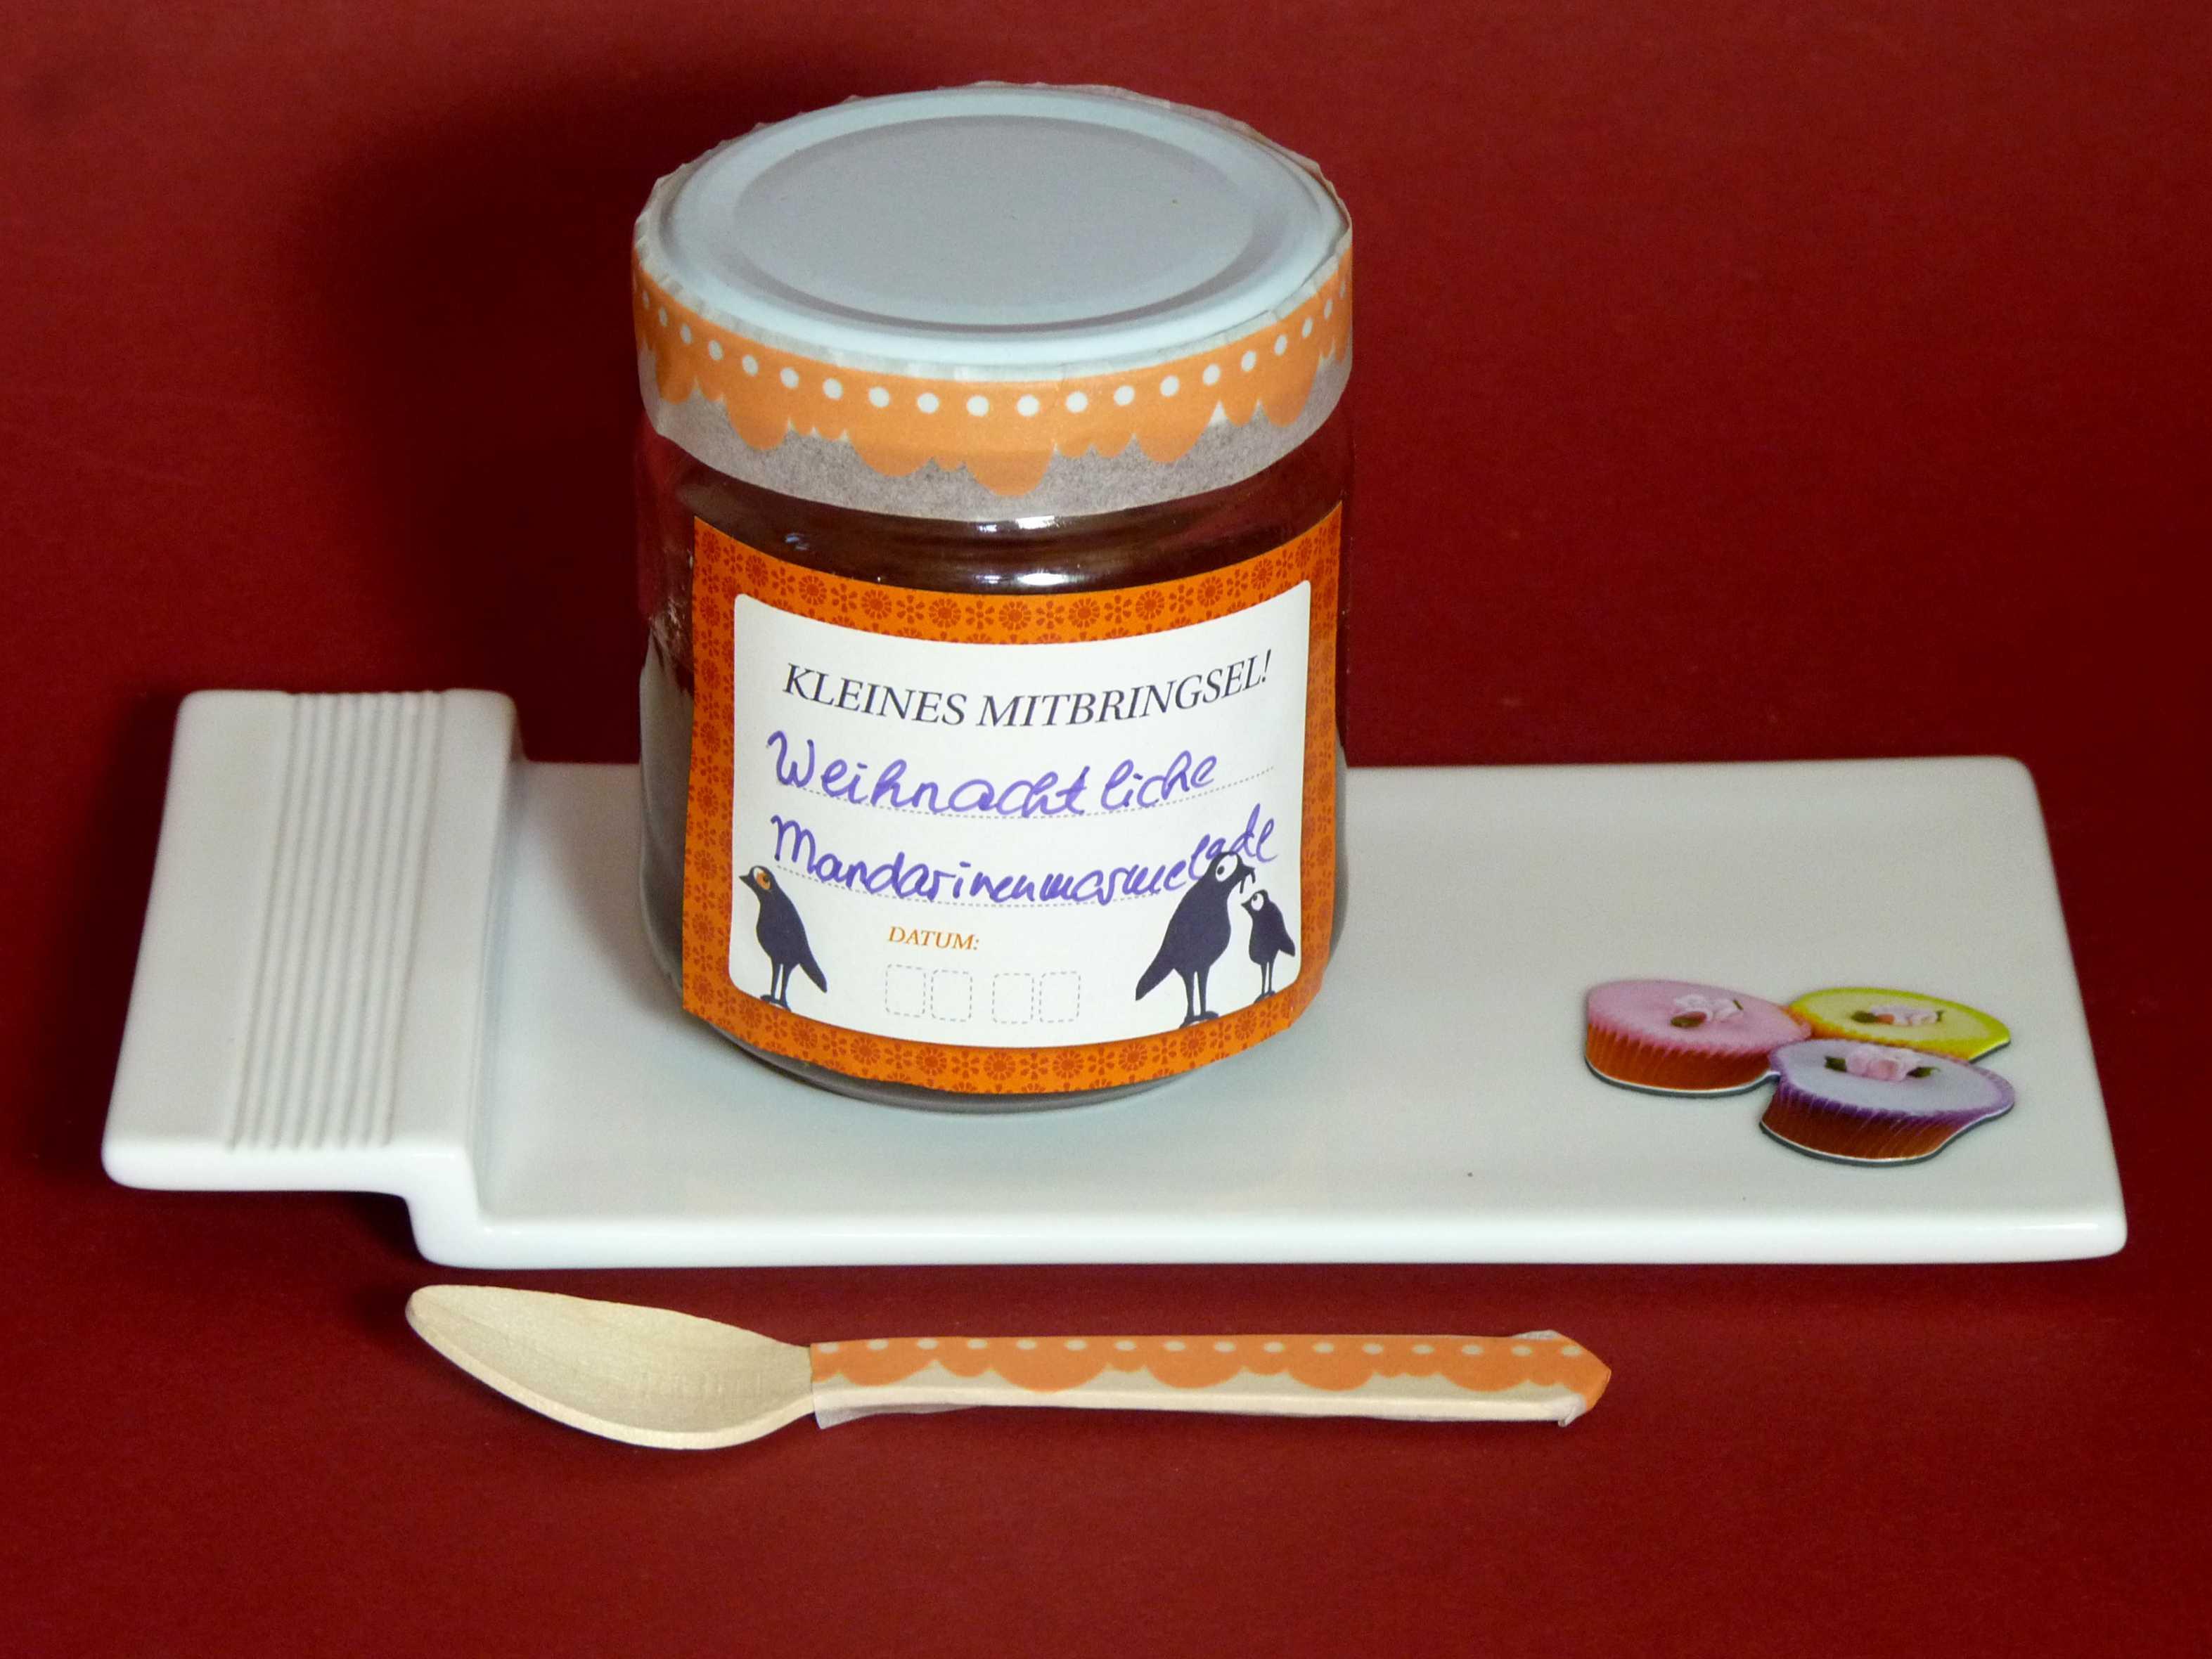 MandarinenmarmeladeXMAS (2)